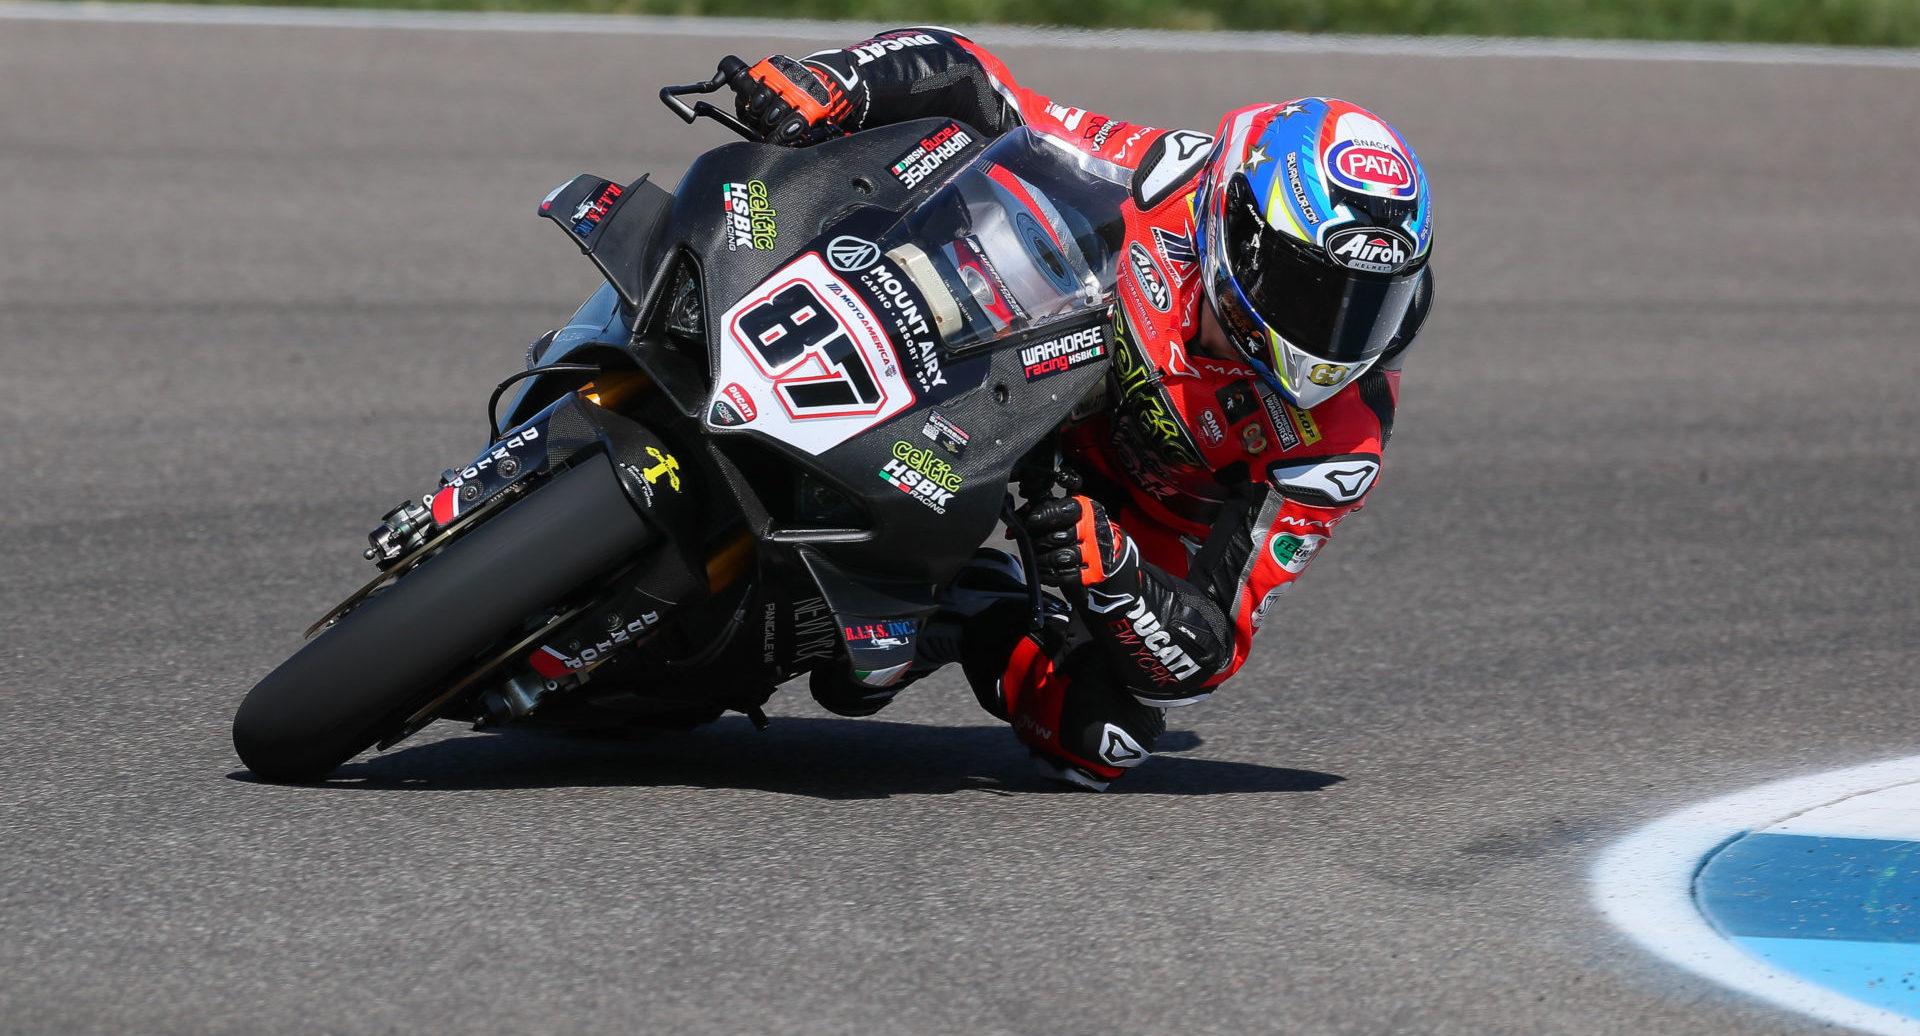 Lorenzo Zanetti (87) at Indianapolis Motor Speedway. Photo by Brian J. Nelson.